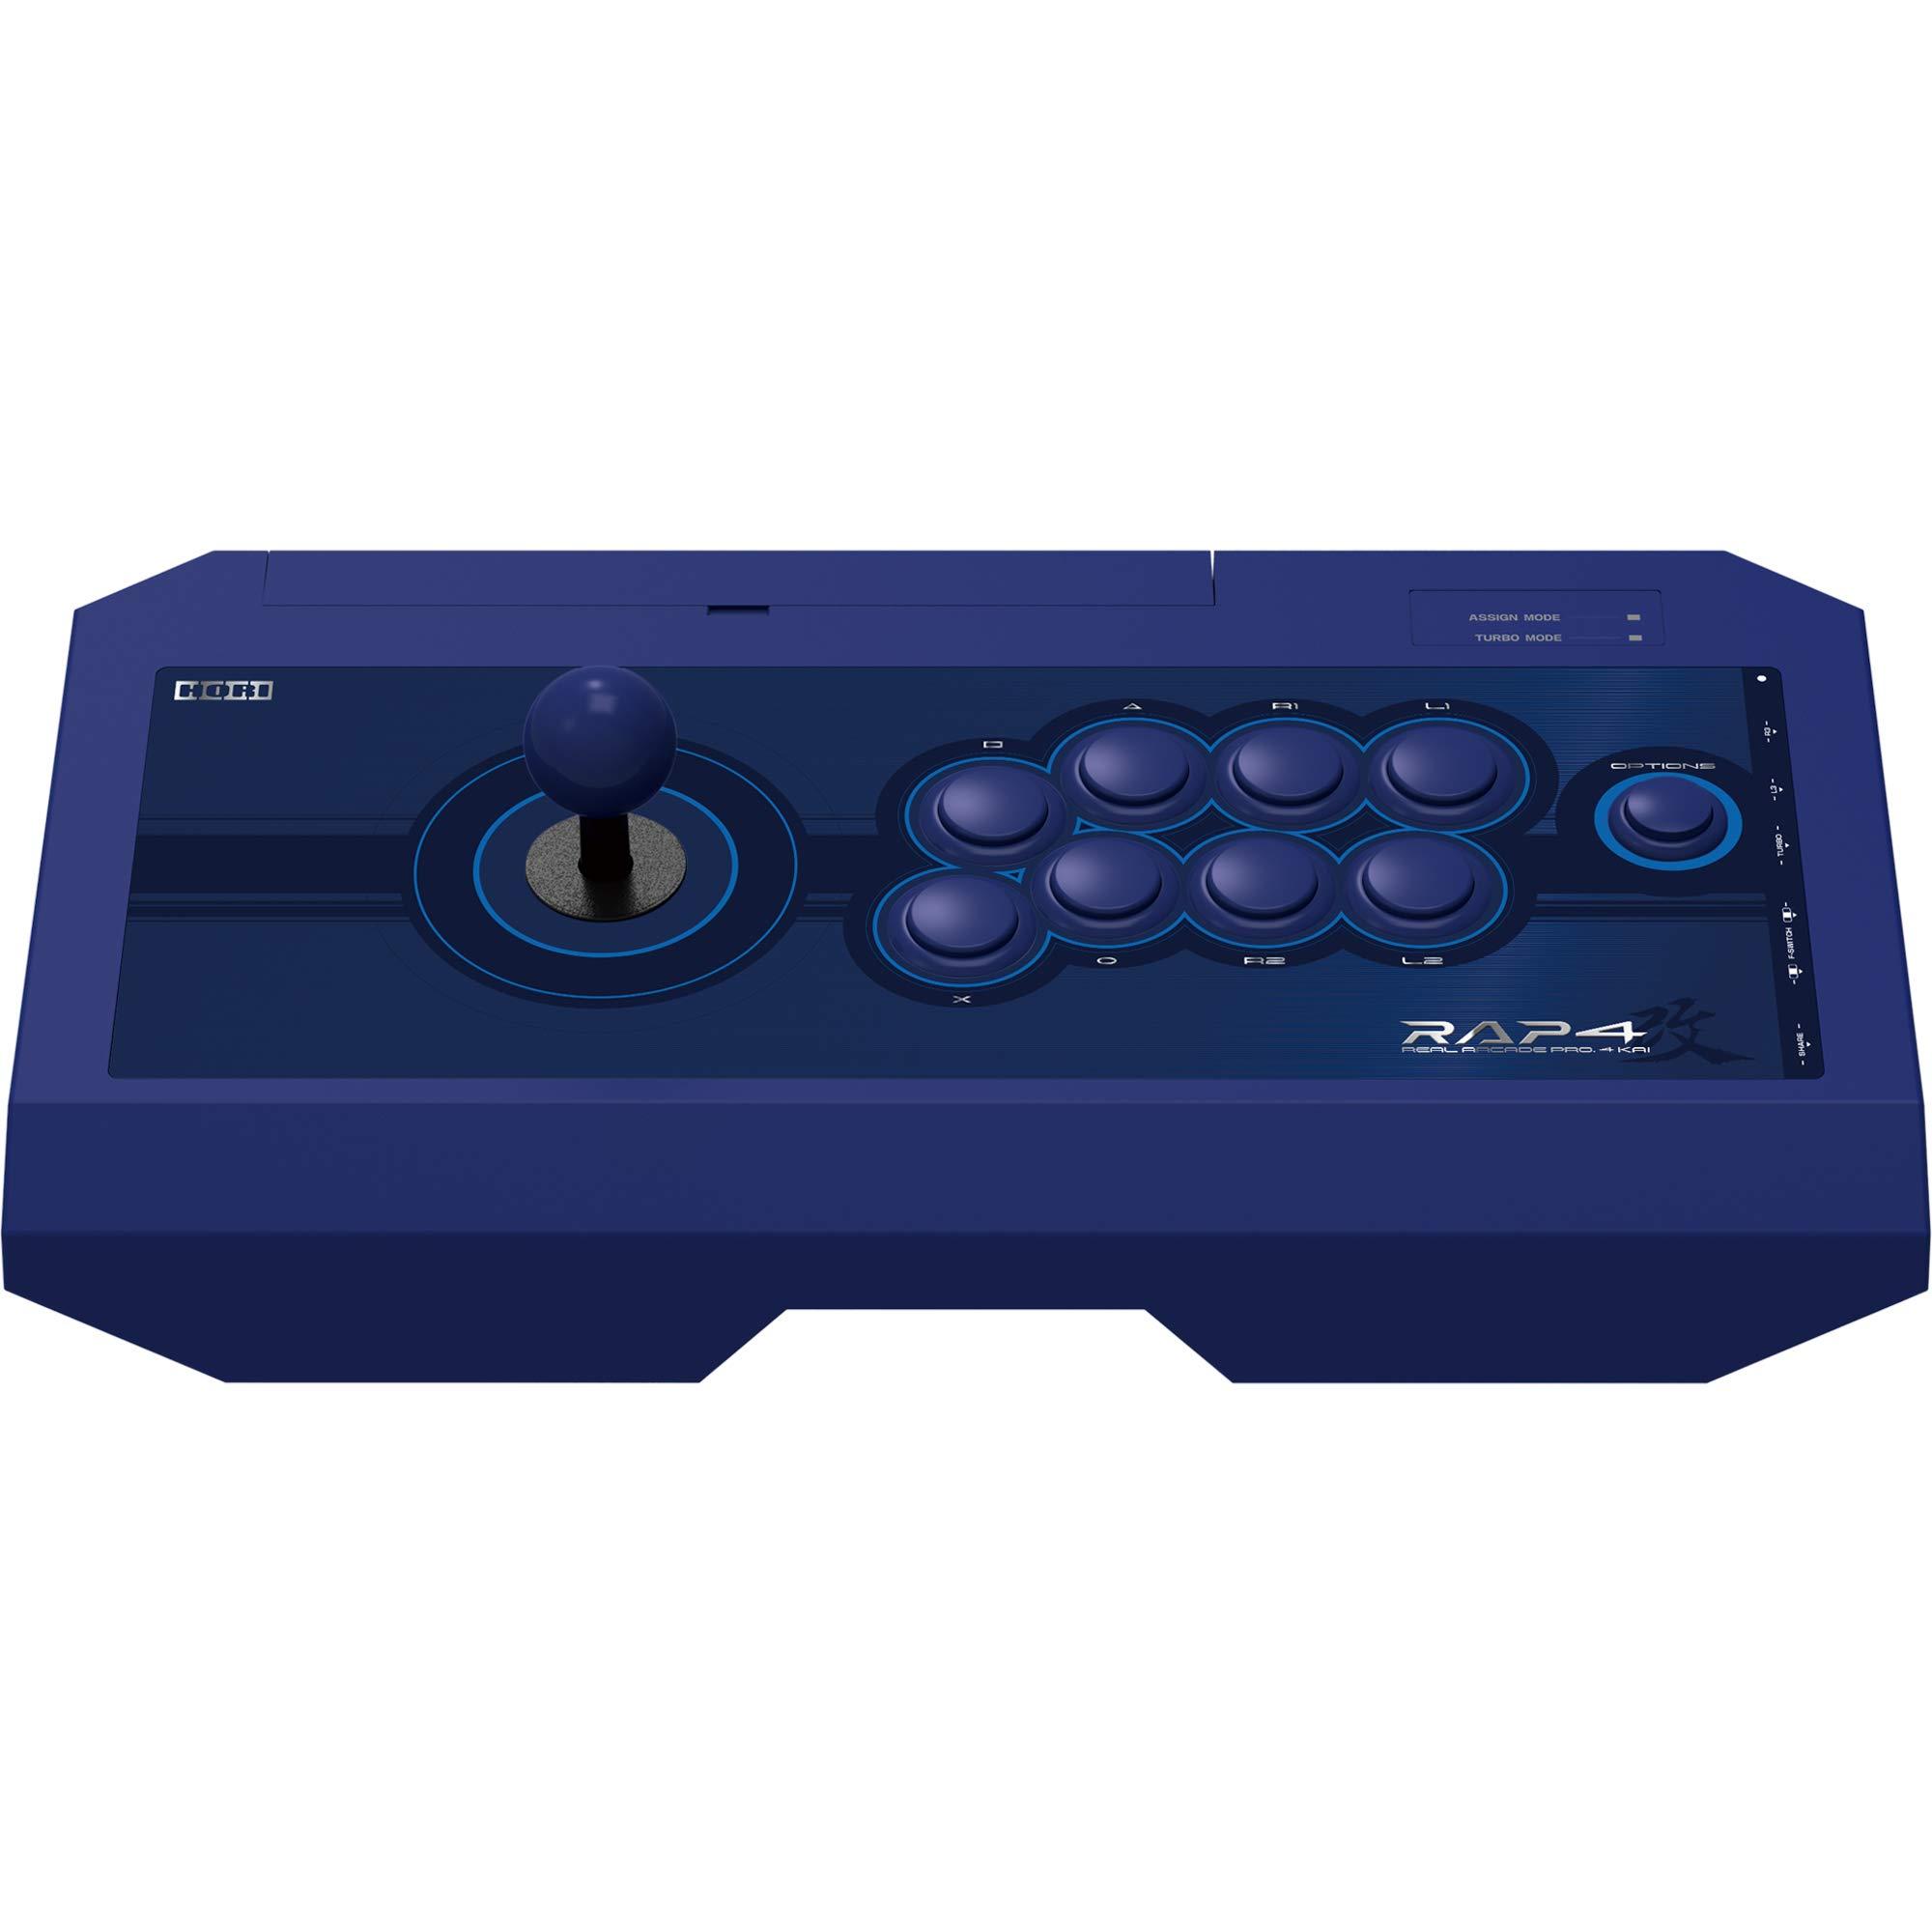 HORI Real Arcade Pro 4 Kai (Blue) for PlayStation 4, PlayStation 3, and PC - PlayStation 4